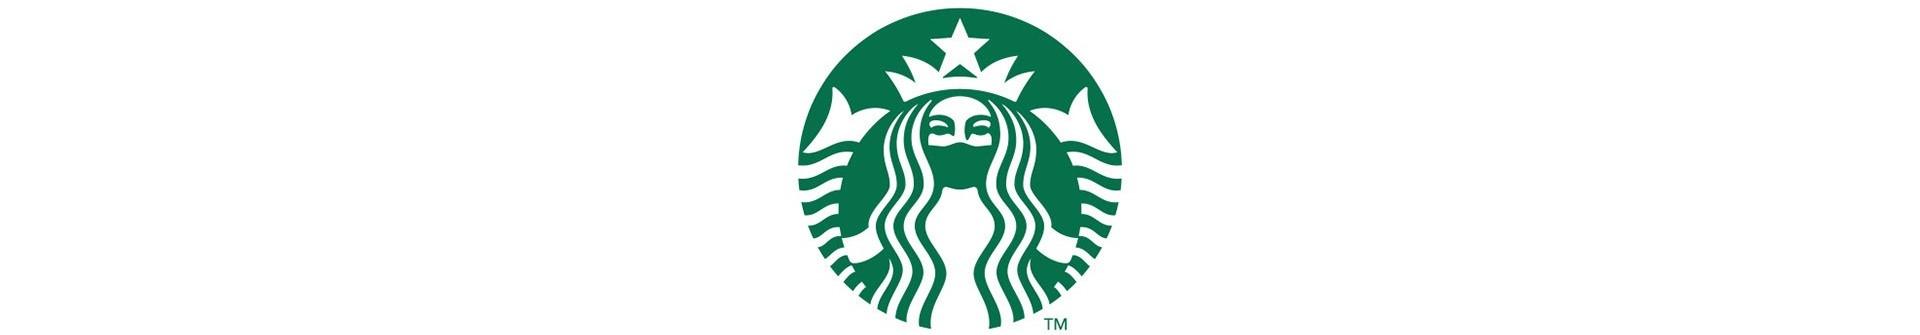 Starbucks-social-distancing-logo-van-designer-Jure-Tovrljan